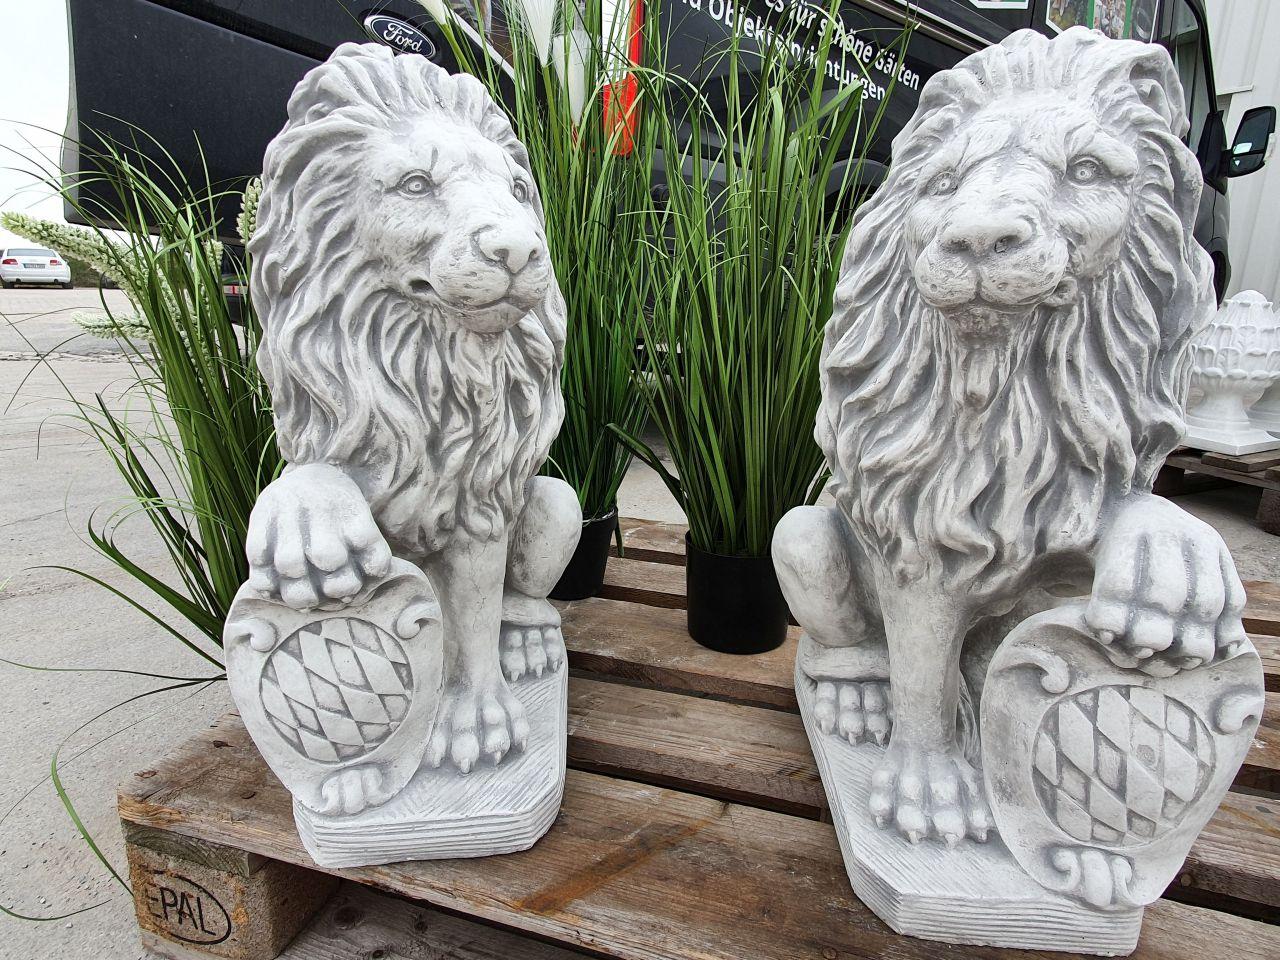 Gartenfigur Löwen mit Wappen 2er Set- antik-grau